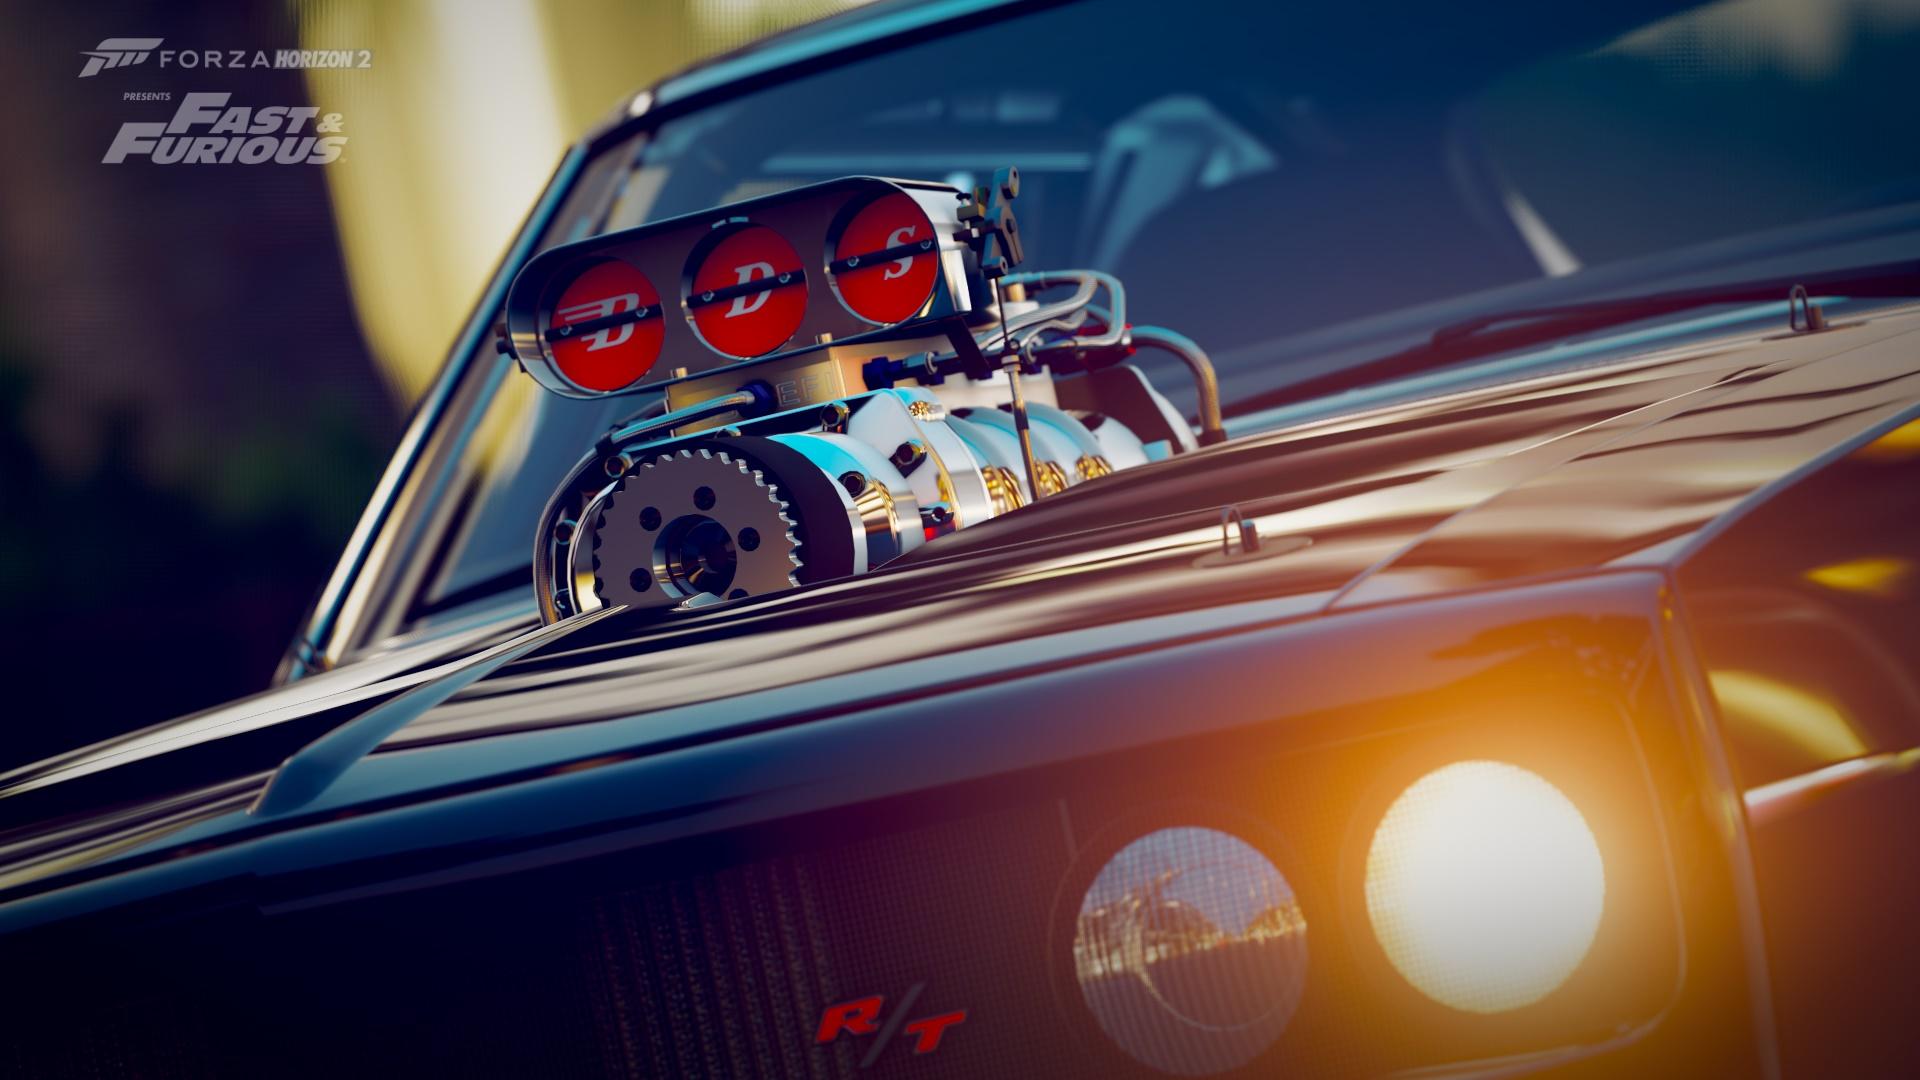 Forza Horizon 2 Presents Fast Furious Photo Contest Week 1 Winner From RosbergF1